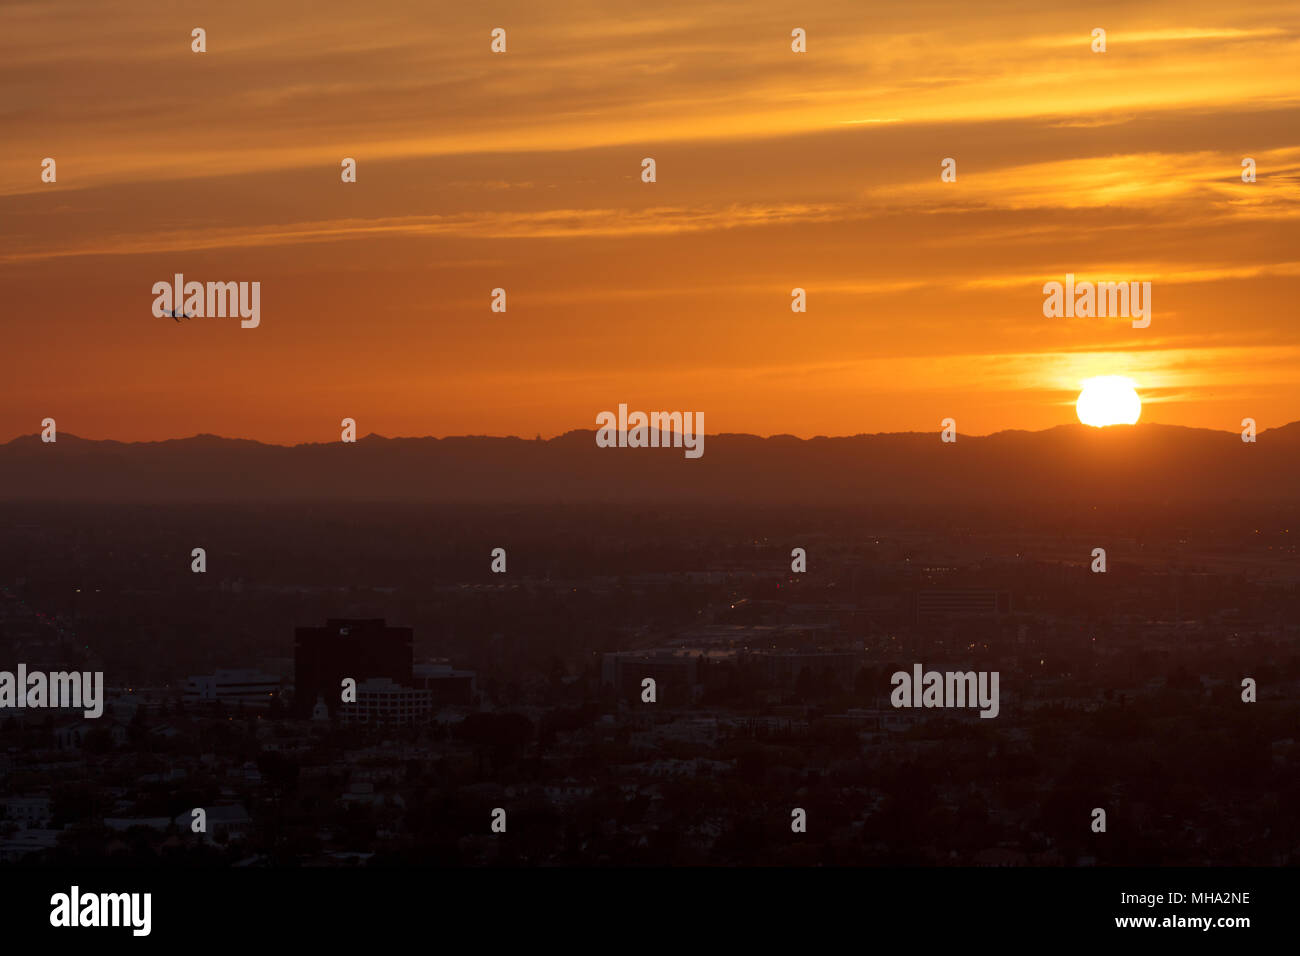 Jetliner taking off at sunset - Stock Image